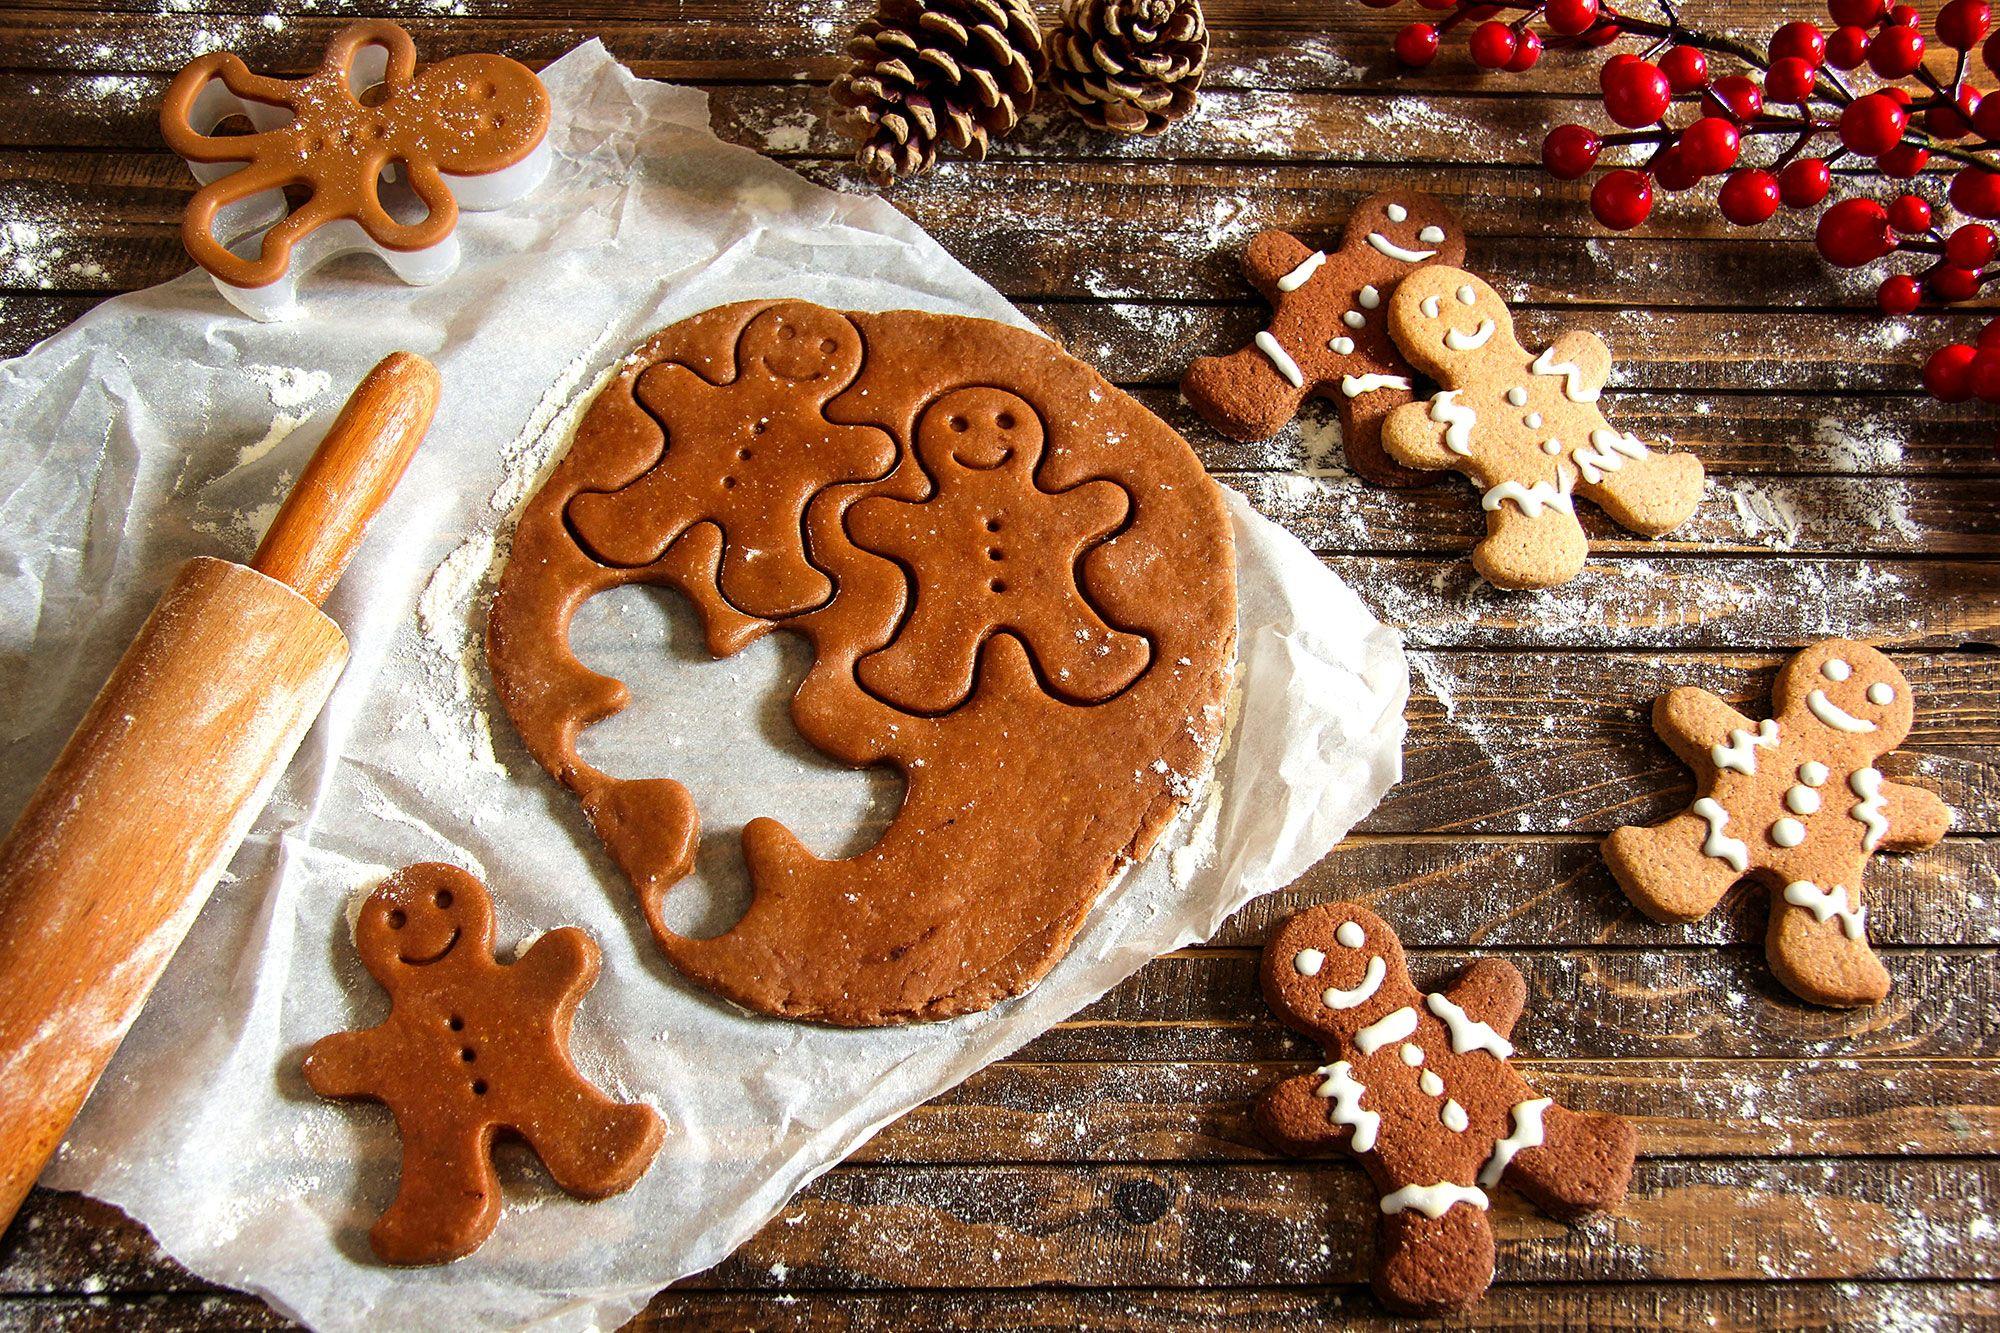 Sally's Baking Addiction gingerbread men cookies